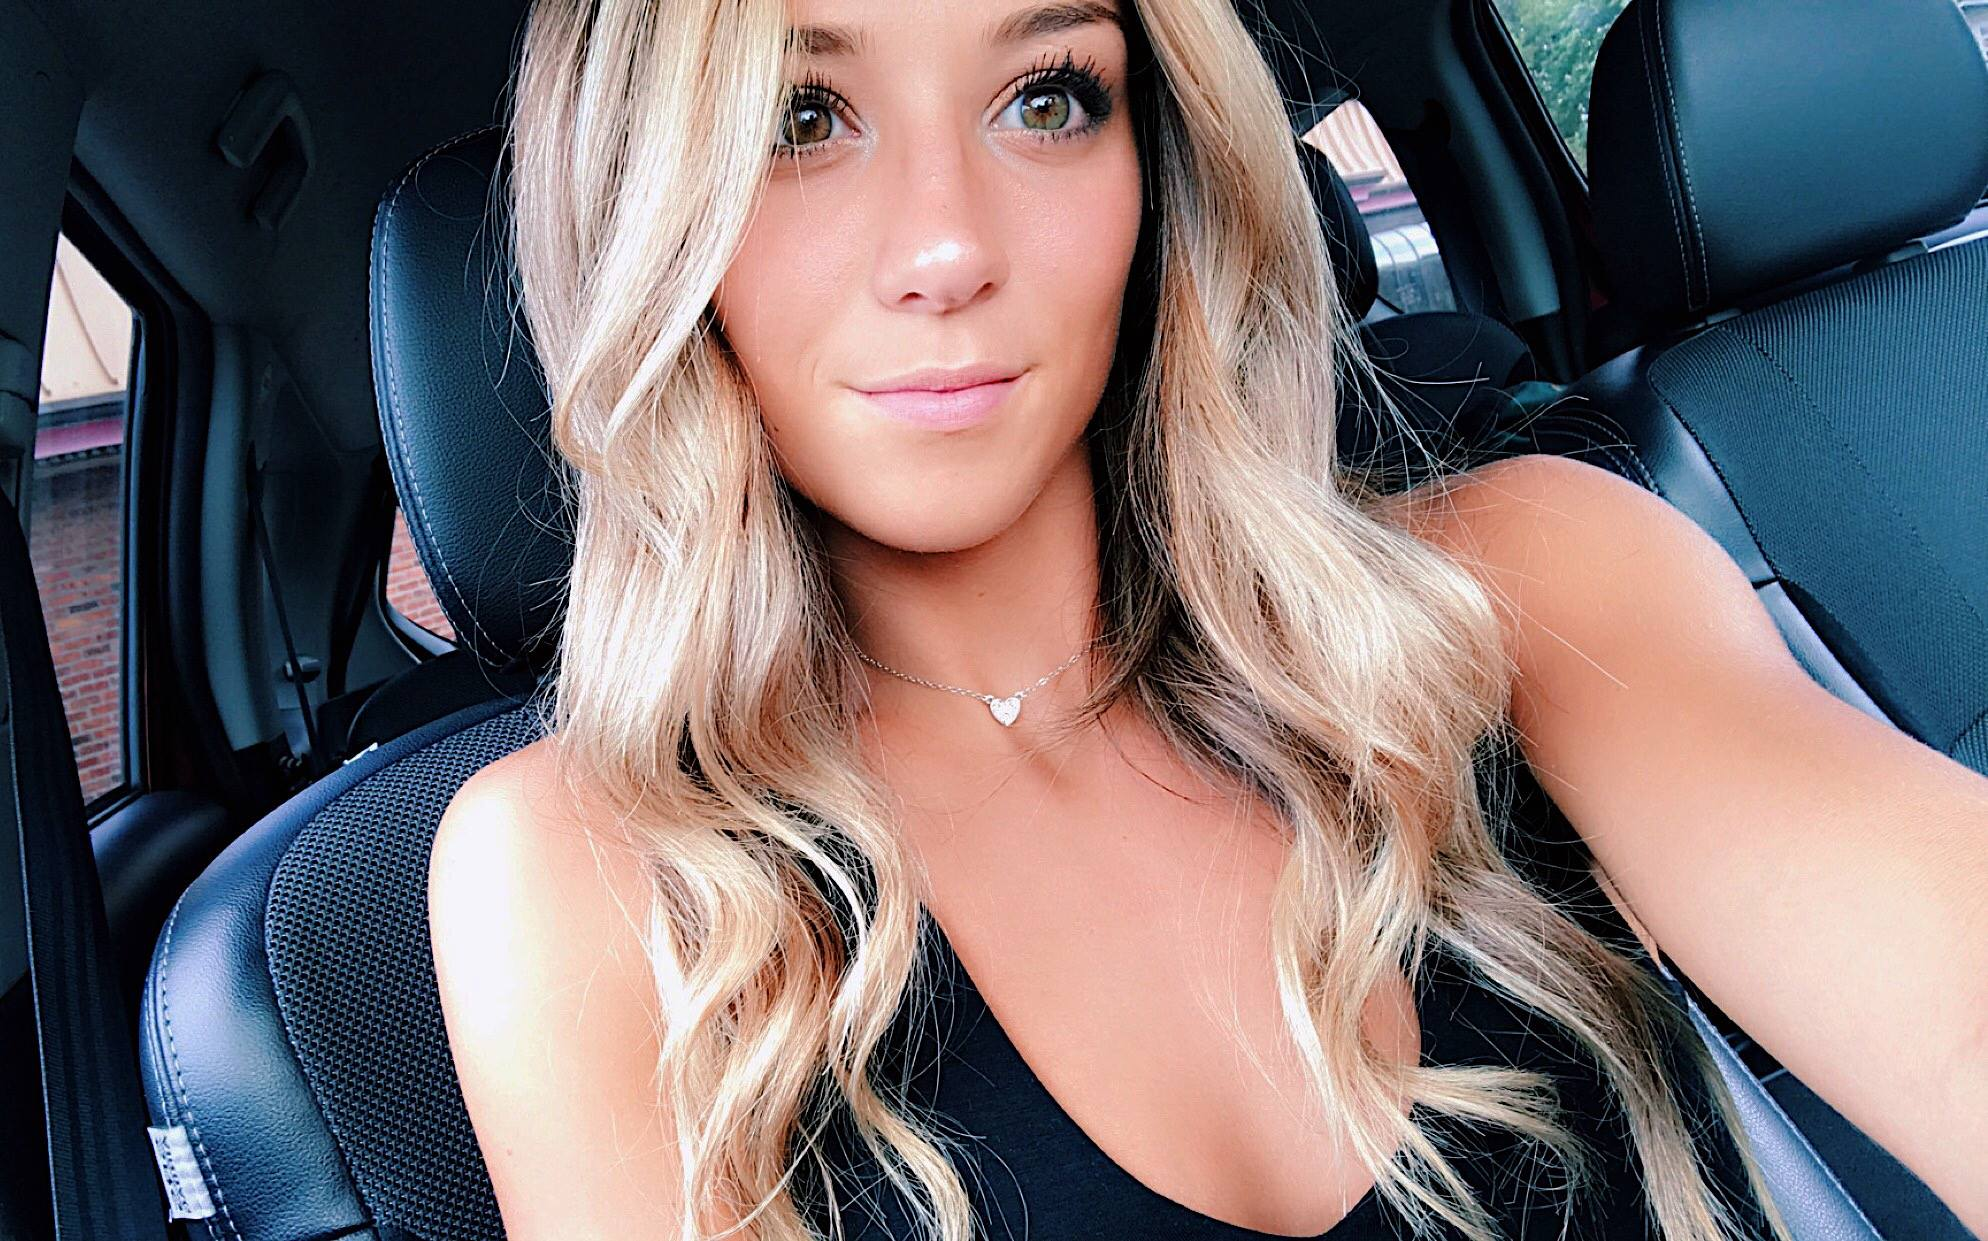 Jenna Miller